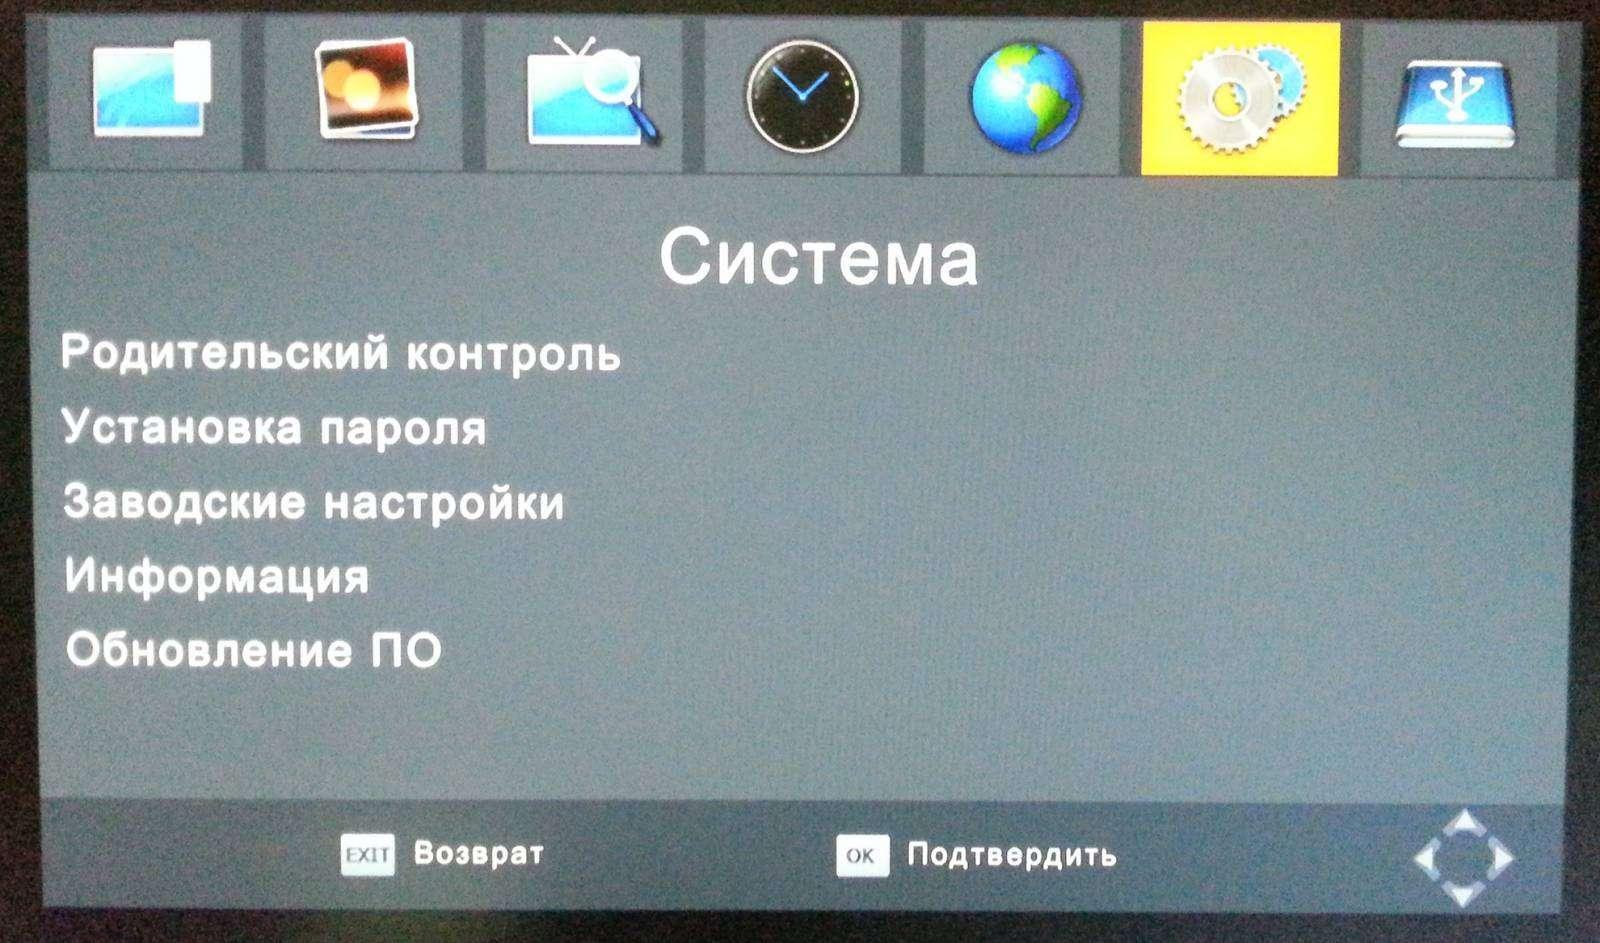 TVC-Mall: DVB-T2 приставка K2 для приема эфирной цифры